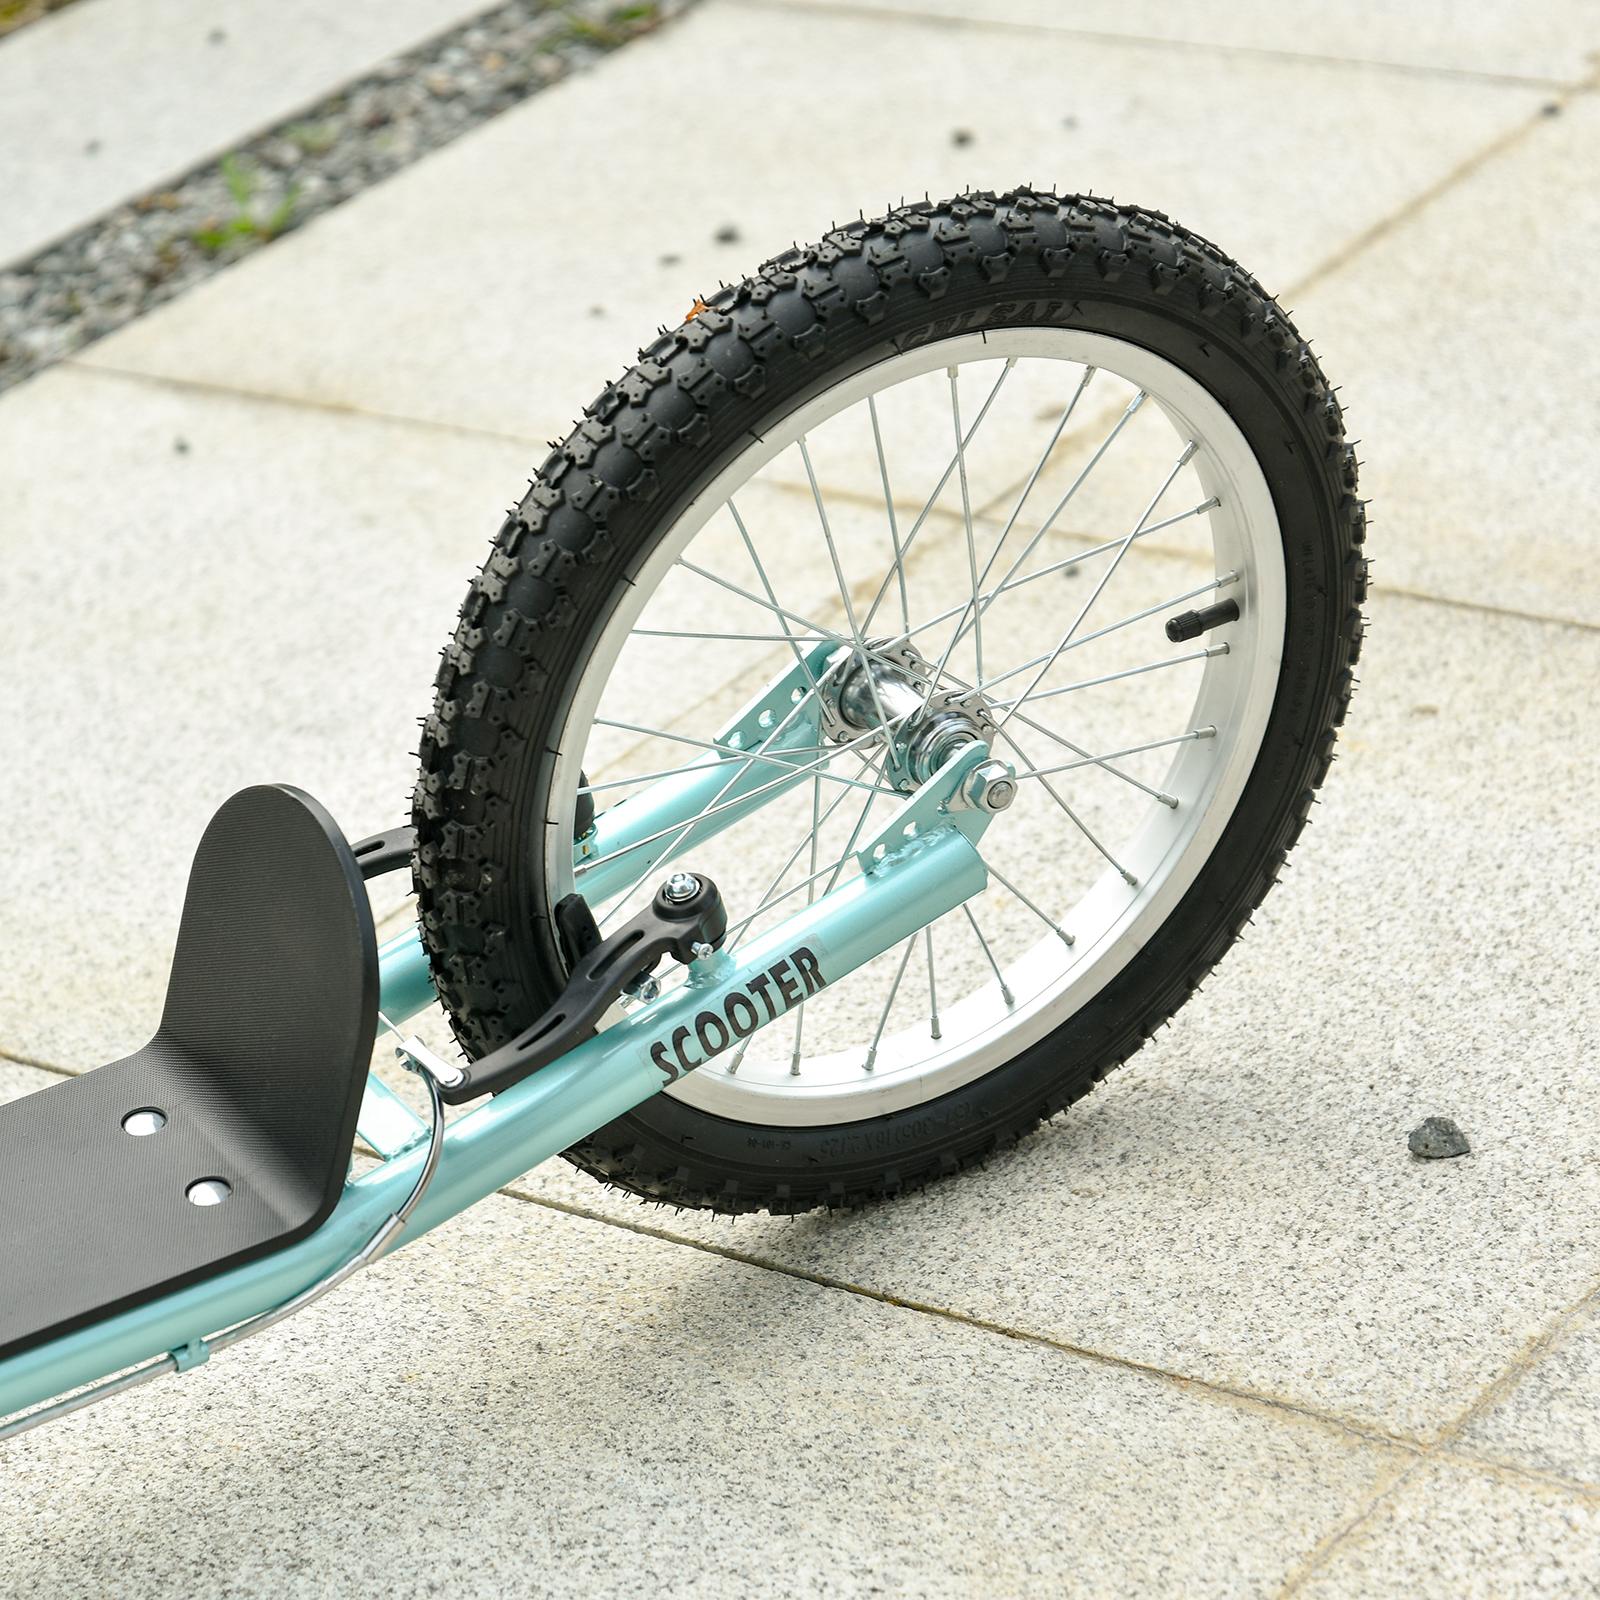 Indexbild 16 - HOMCOM-Tretroller-Kinderroller-Scooter-Cityroller-Roller-verstellbar-Blau-Gruen